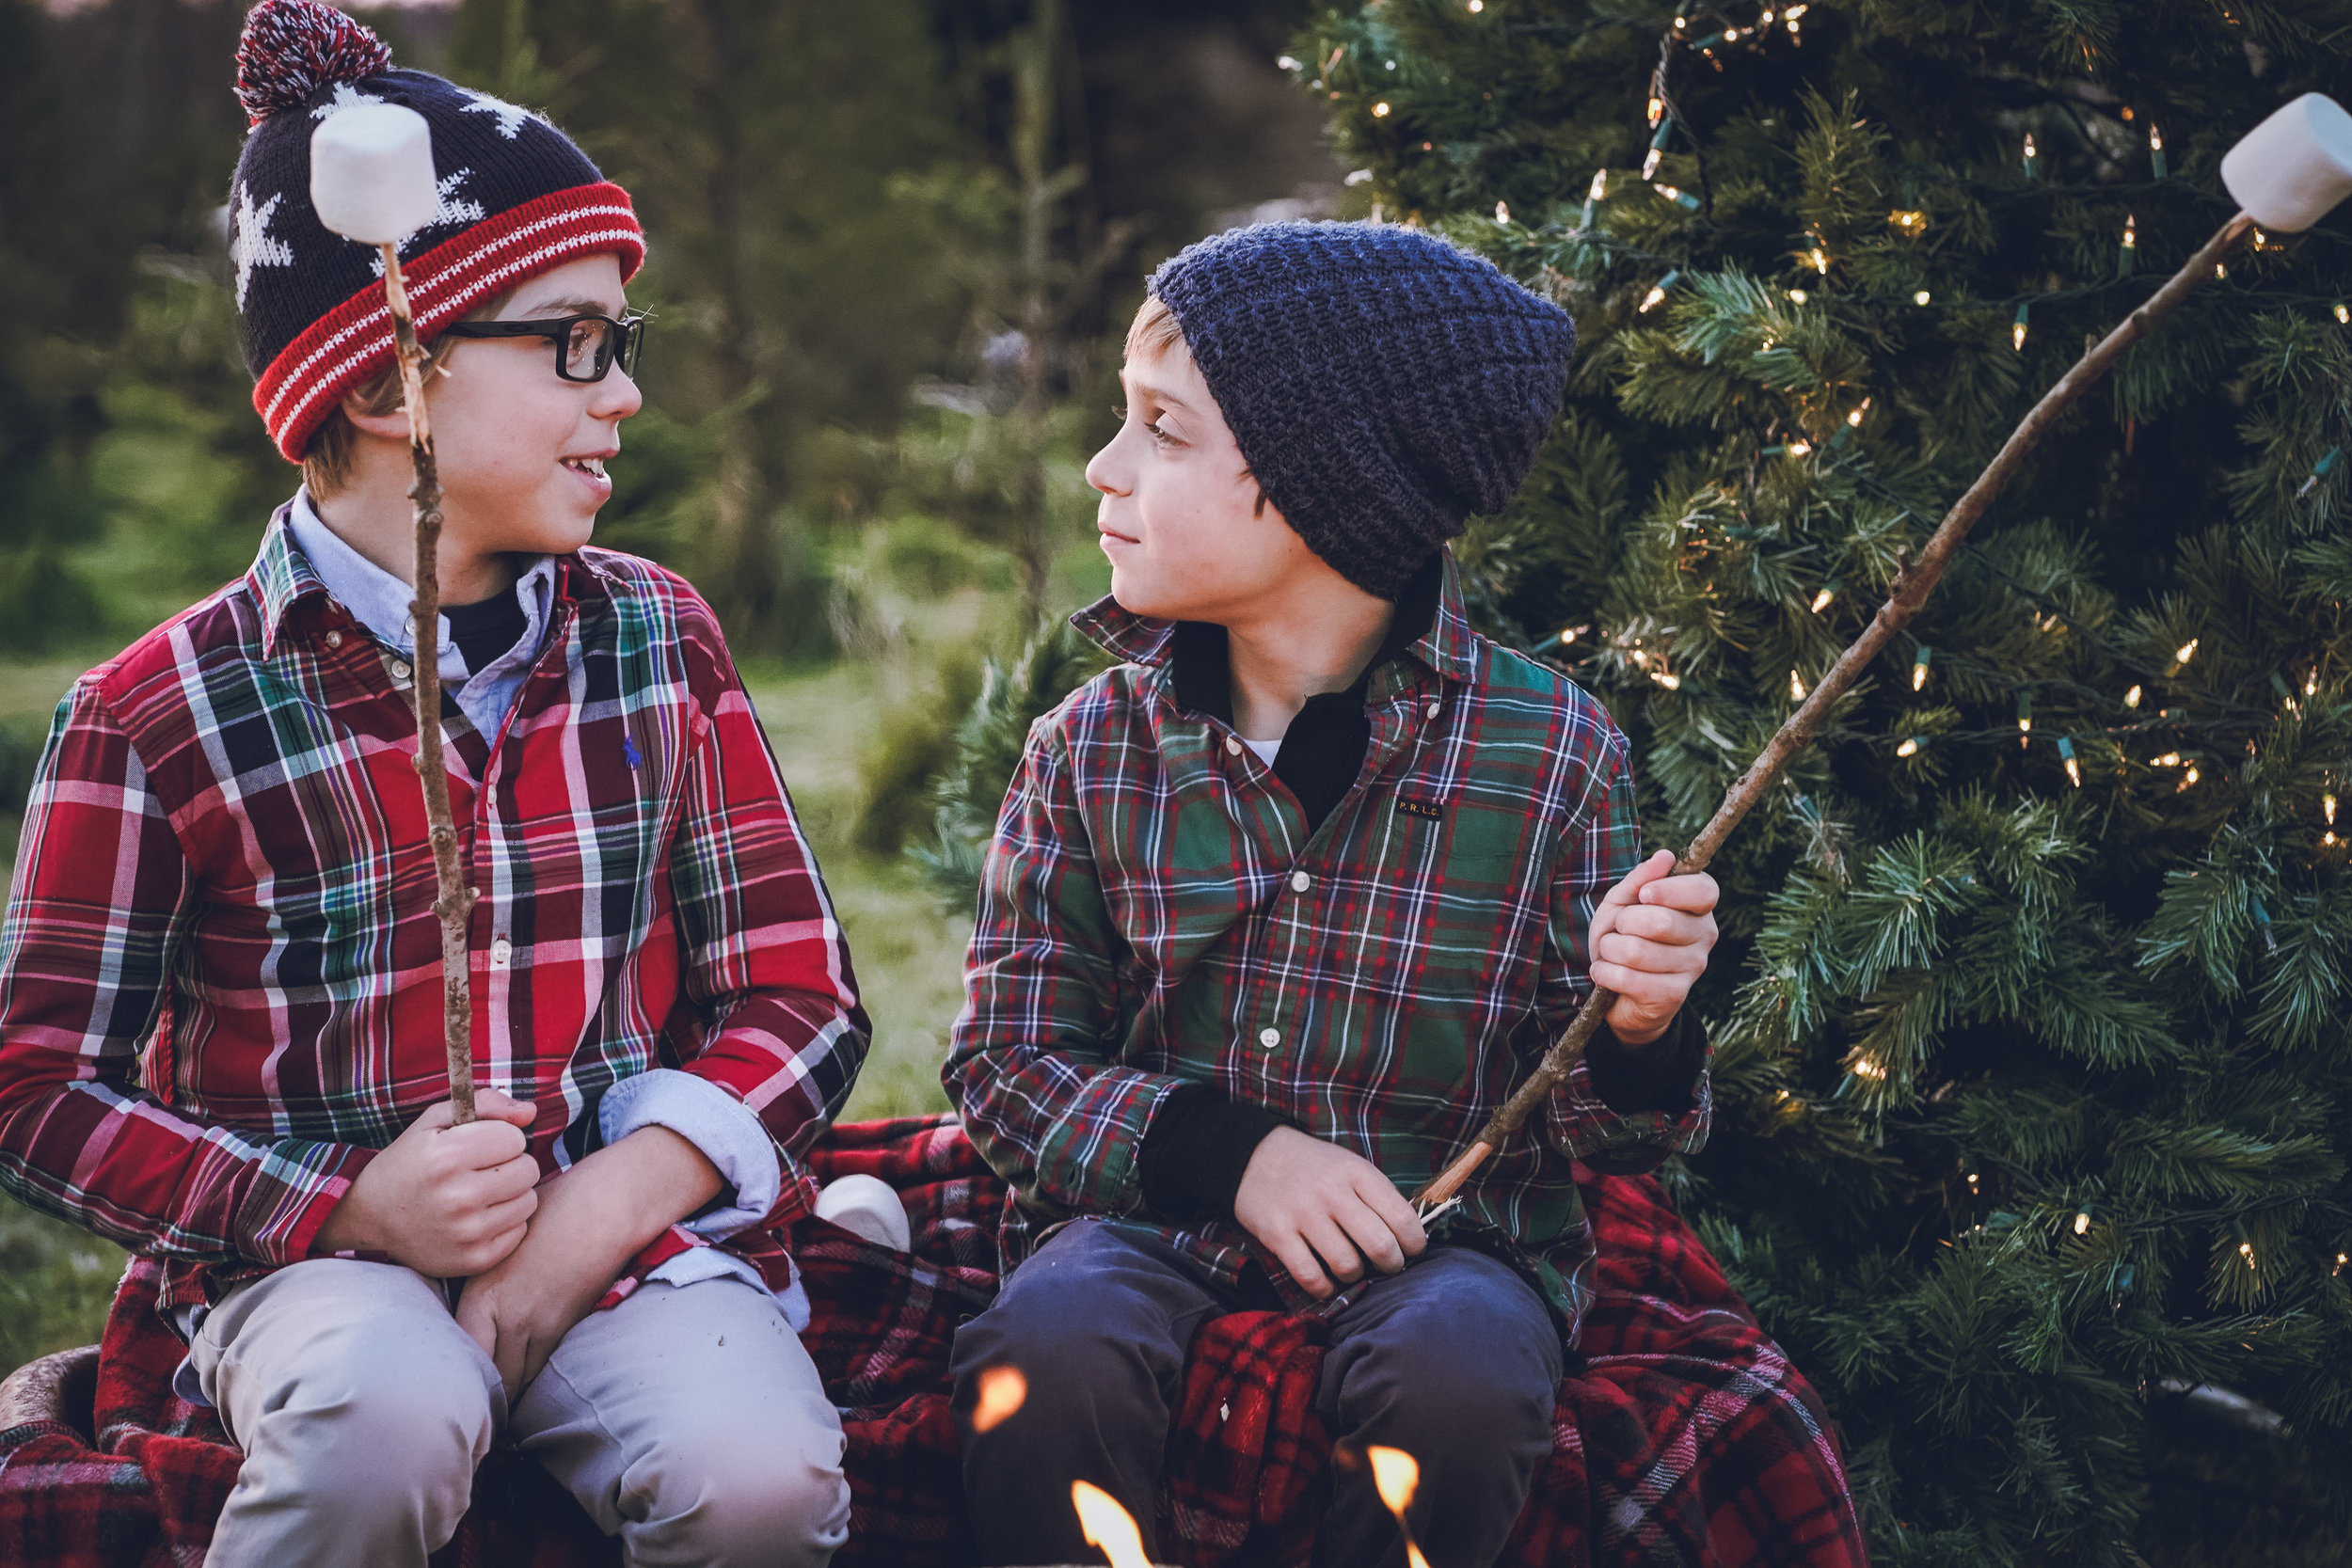 Clarks-Summit-Scranton-Photographers-christmas-holidays-card-13.jpg